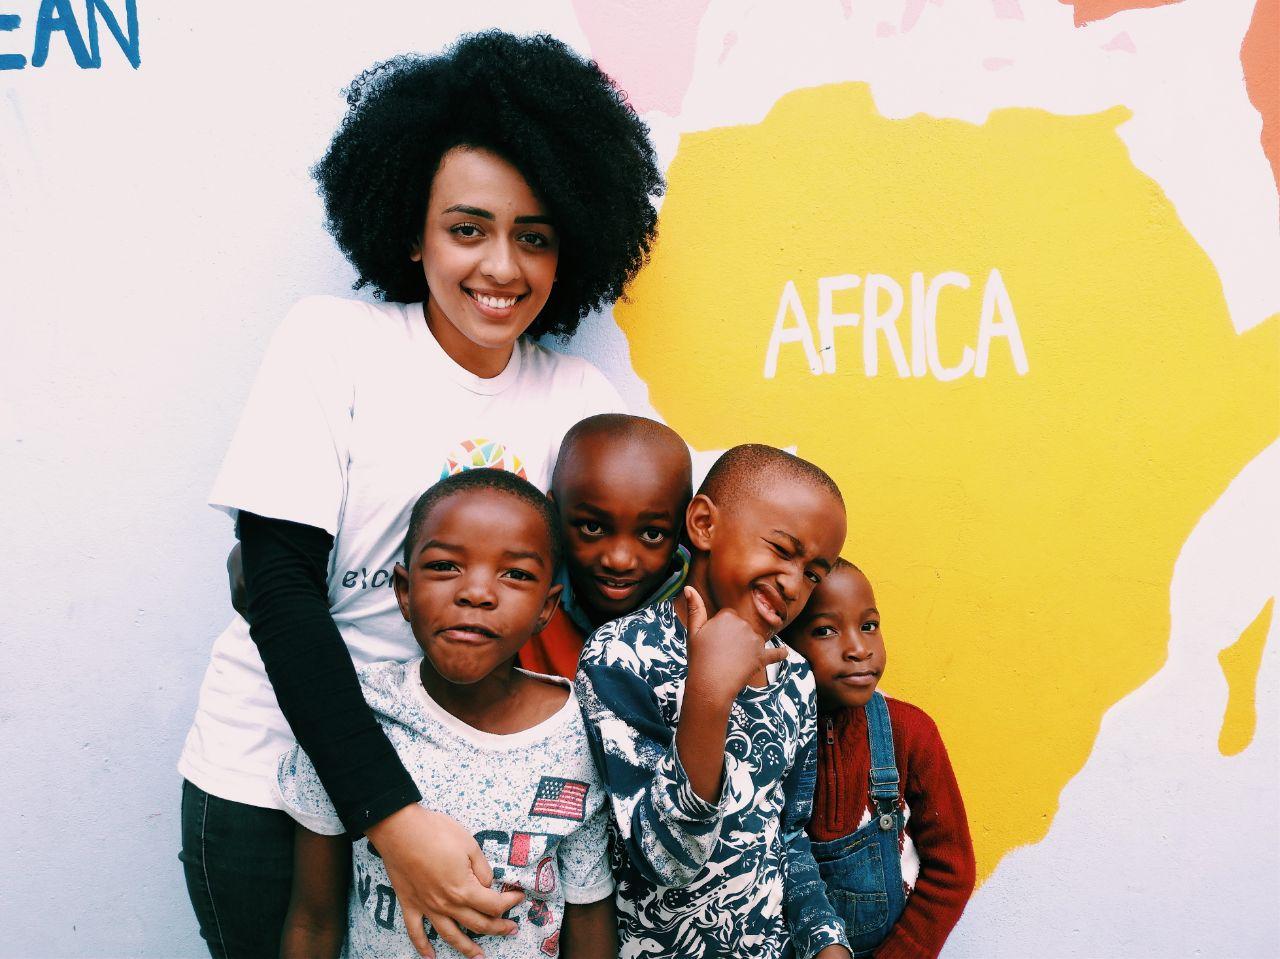 Cape Town Smiles: Programa de Voluntariado para Dentistas!